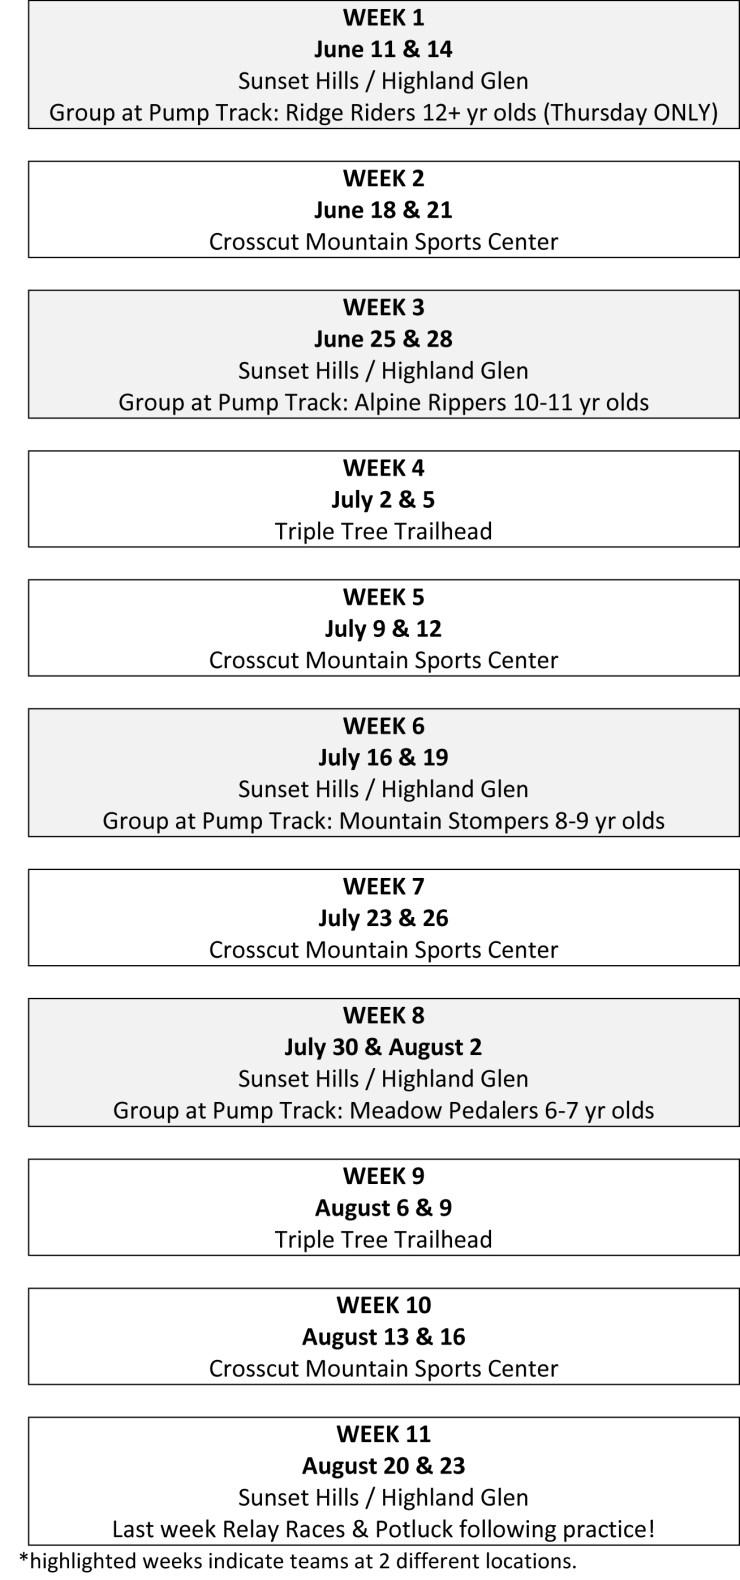 WEEK 1 schedule 2